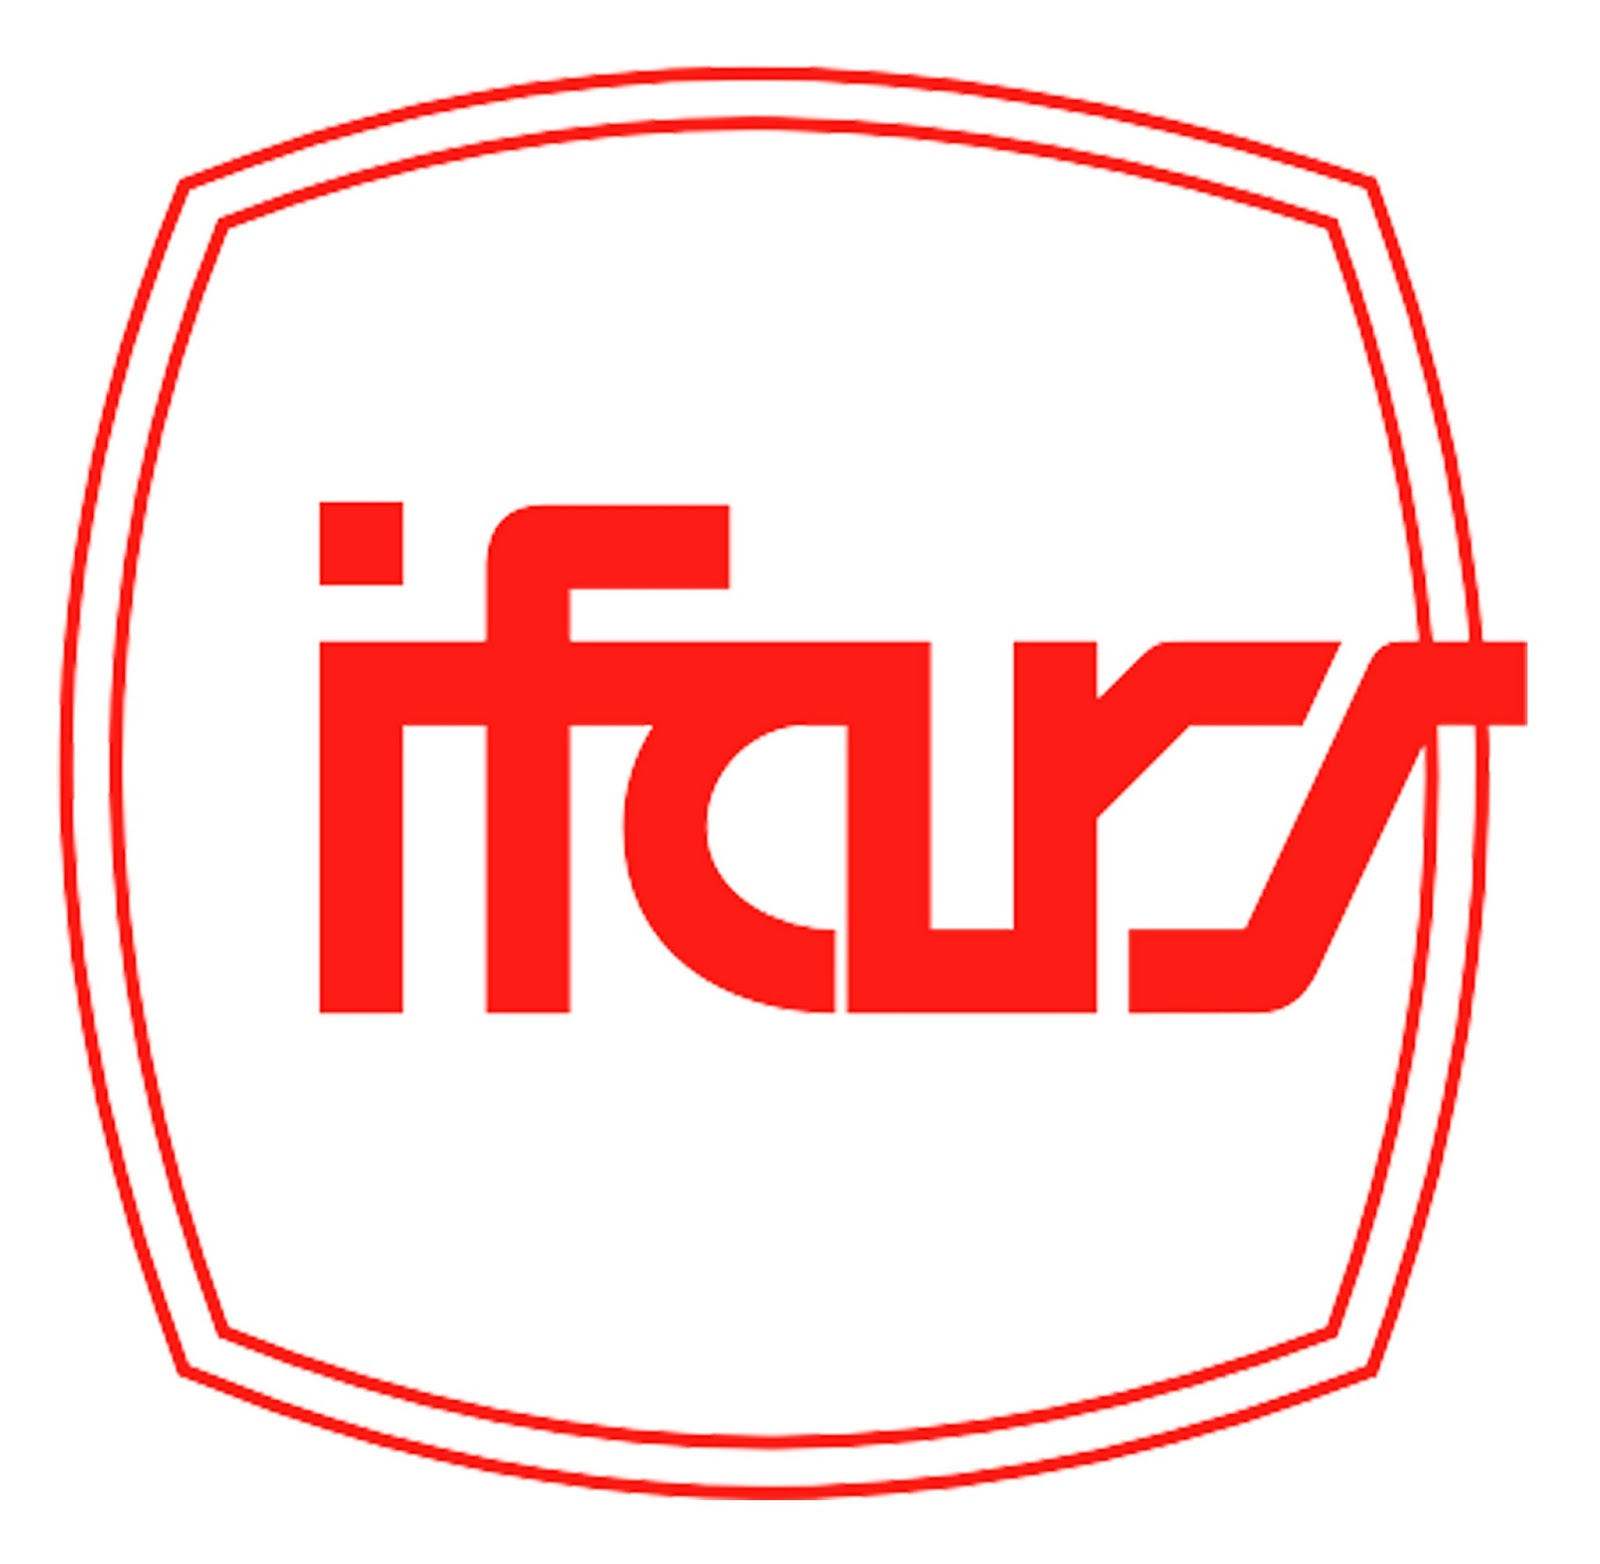 Loker Terbaru Karanganyar Portal Info Lowongan Kerja Terbaru Di Solo Raya Kerja Di Pt Ifars Pharmaceutical Laboratories Karanganyar Surakarta